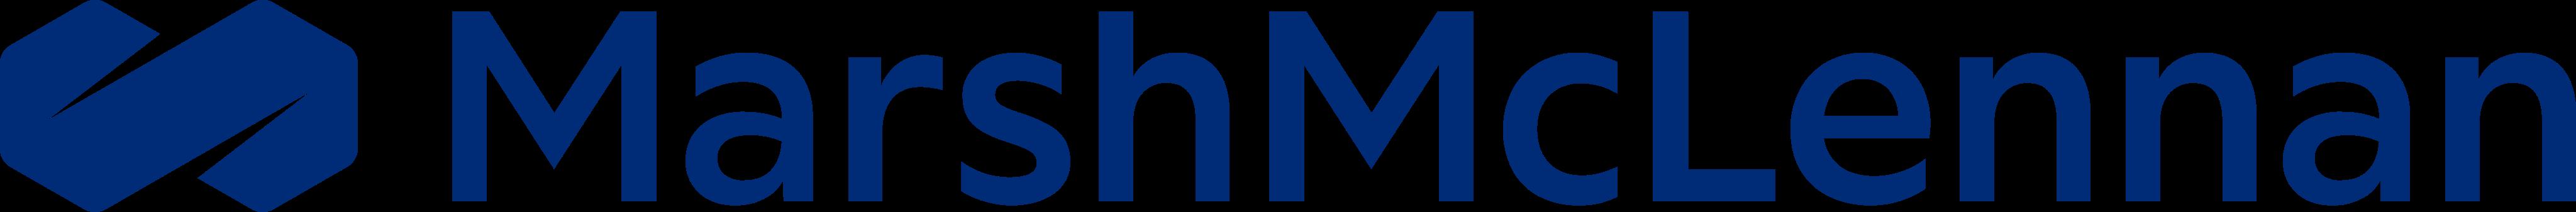 Marsh & McLennan Logo.